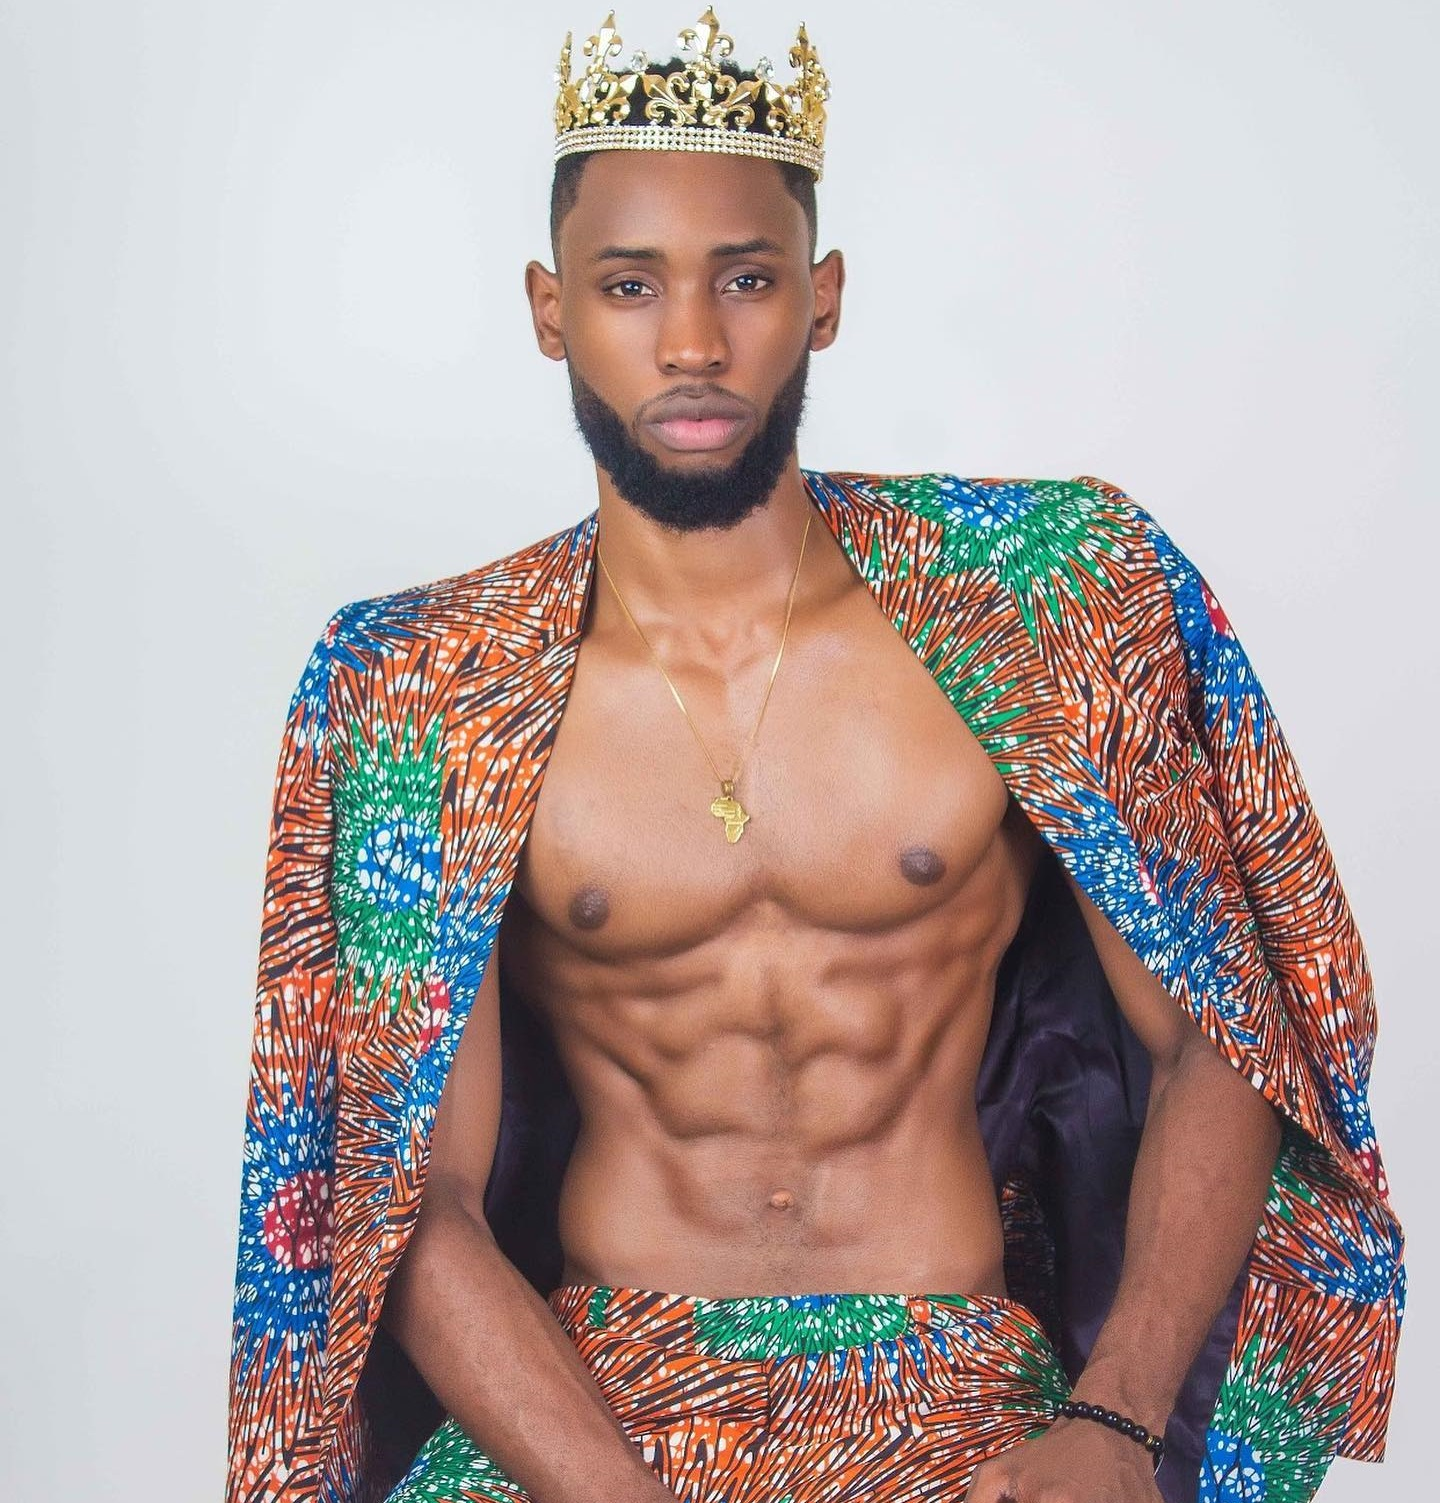 PHOTOS: Mr Ideal Nigeria Unveils its Top 40 Contestants